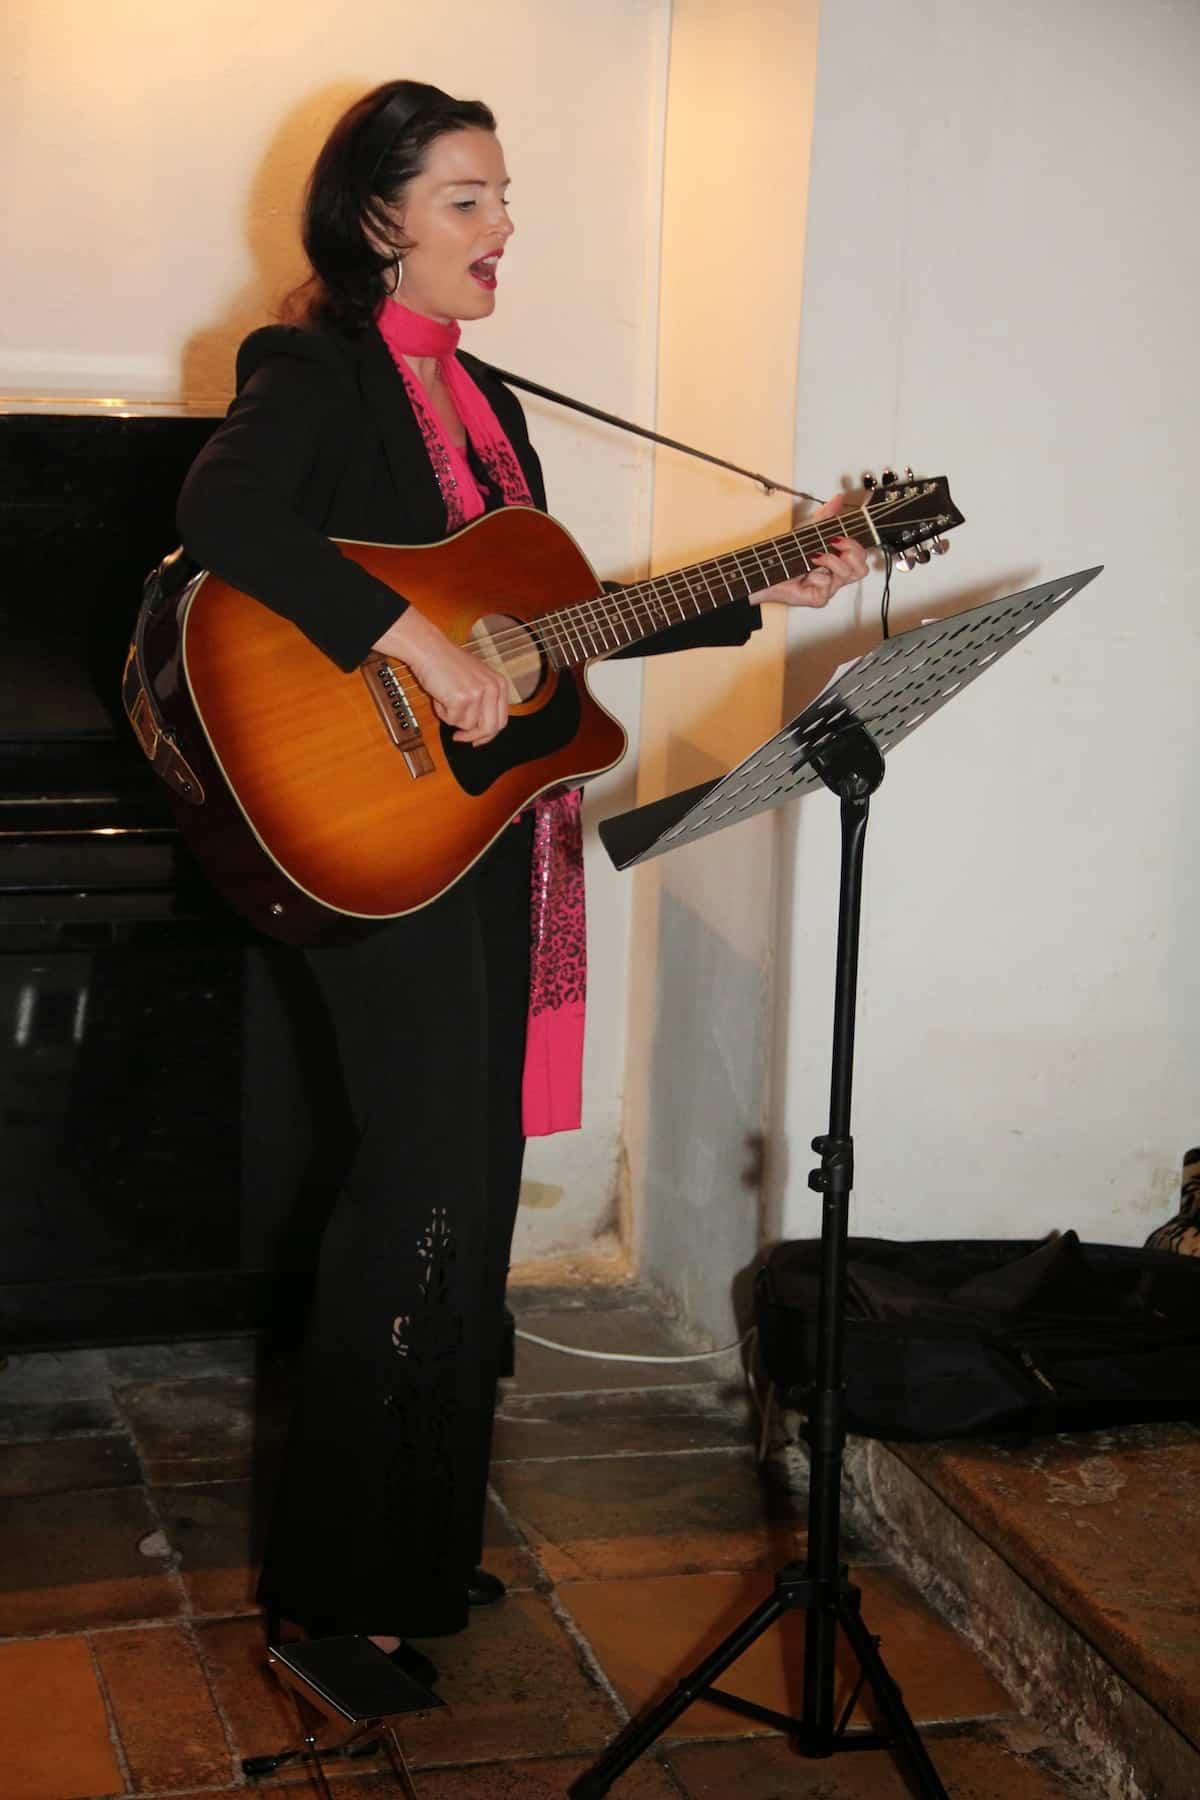 musik-taufe-mit-danja-bauer-2014-02